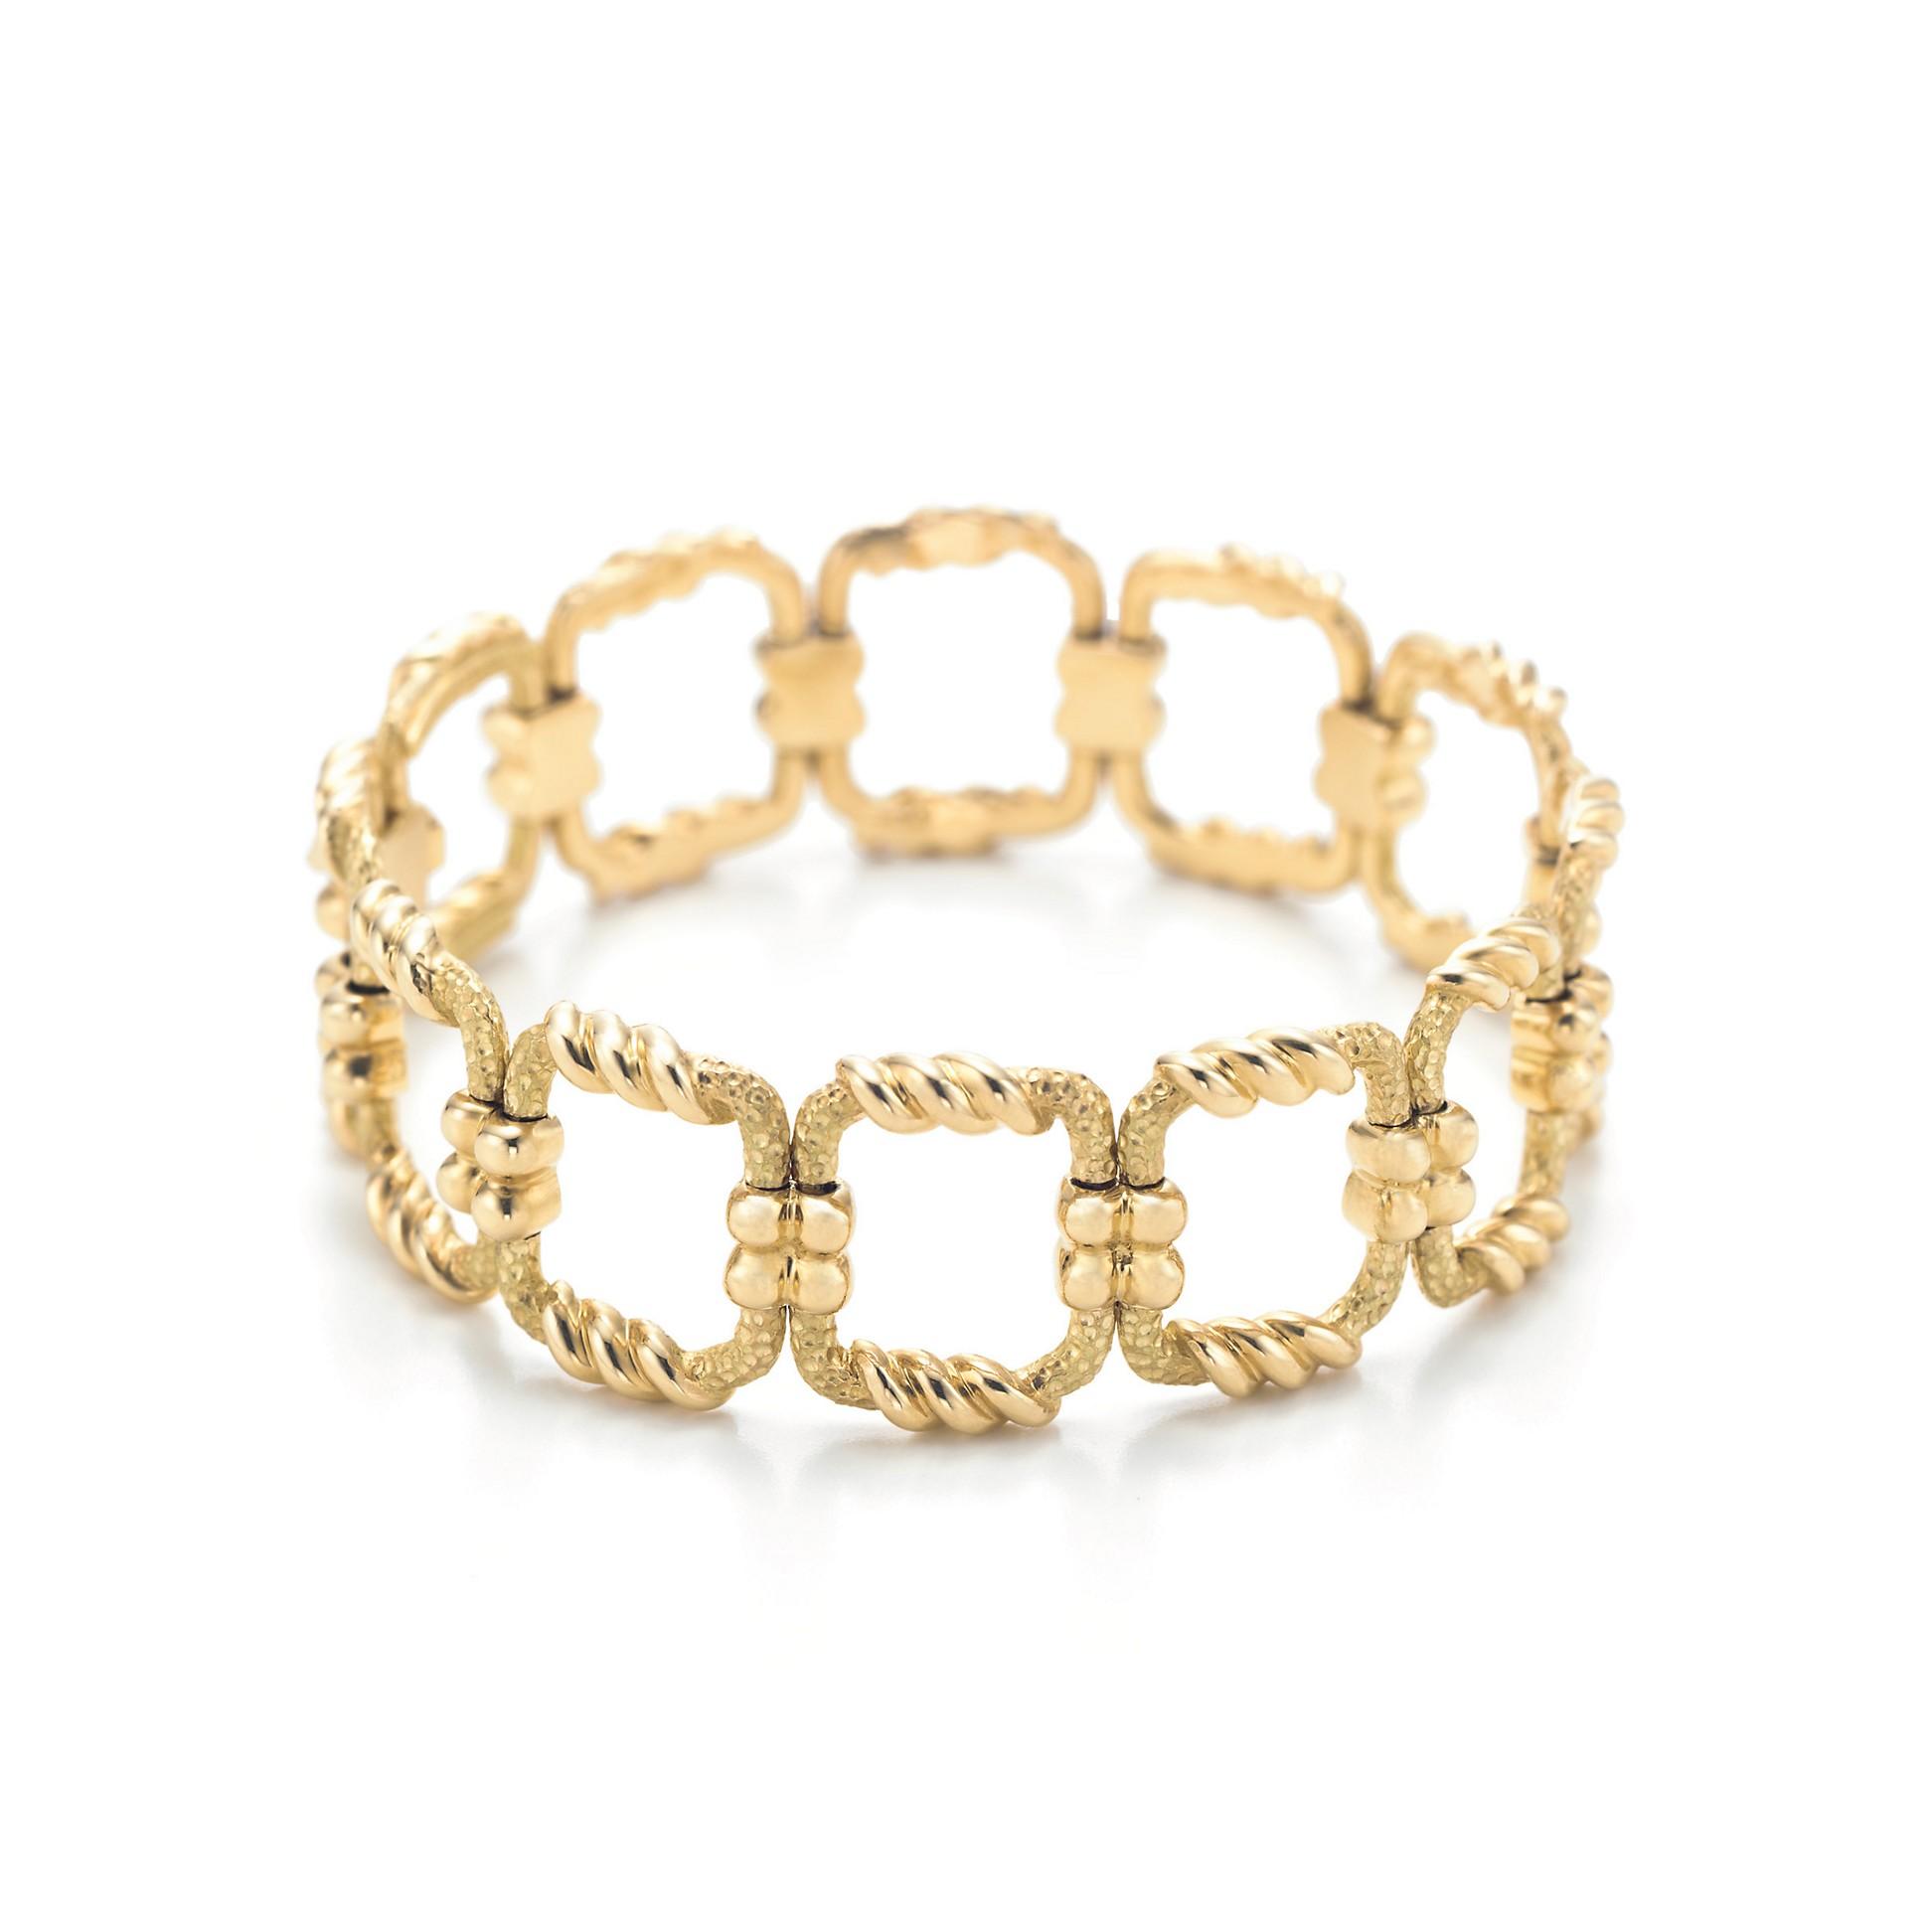 Tiffany & Co. Schlumberger®        Open Square Bracelet by Tiffany & Co. Schlumberger®